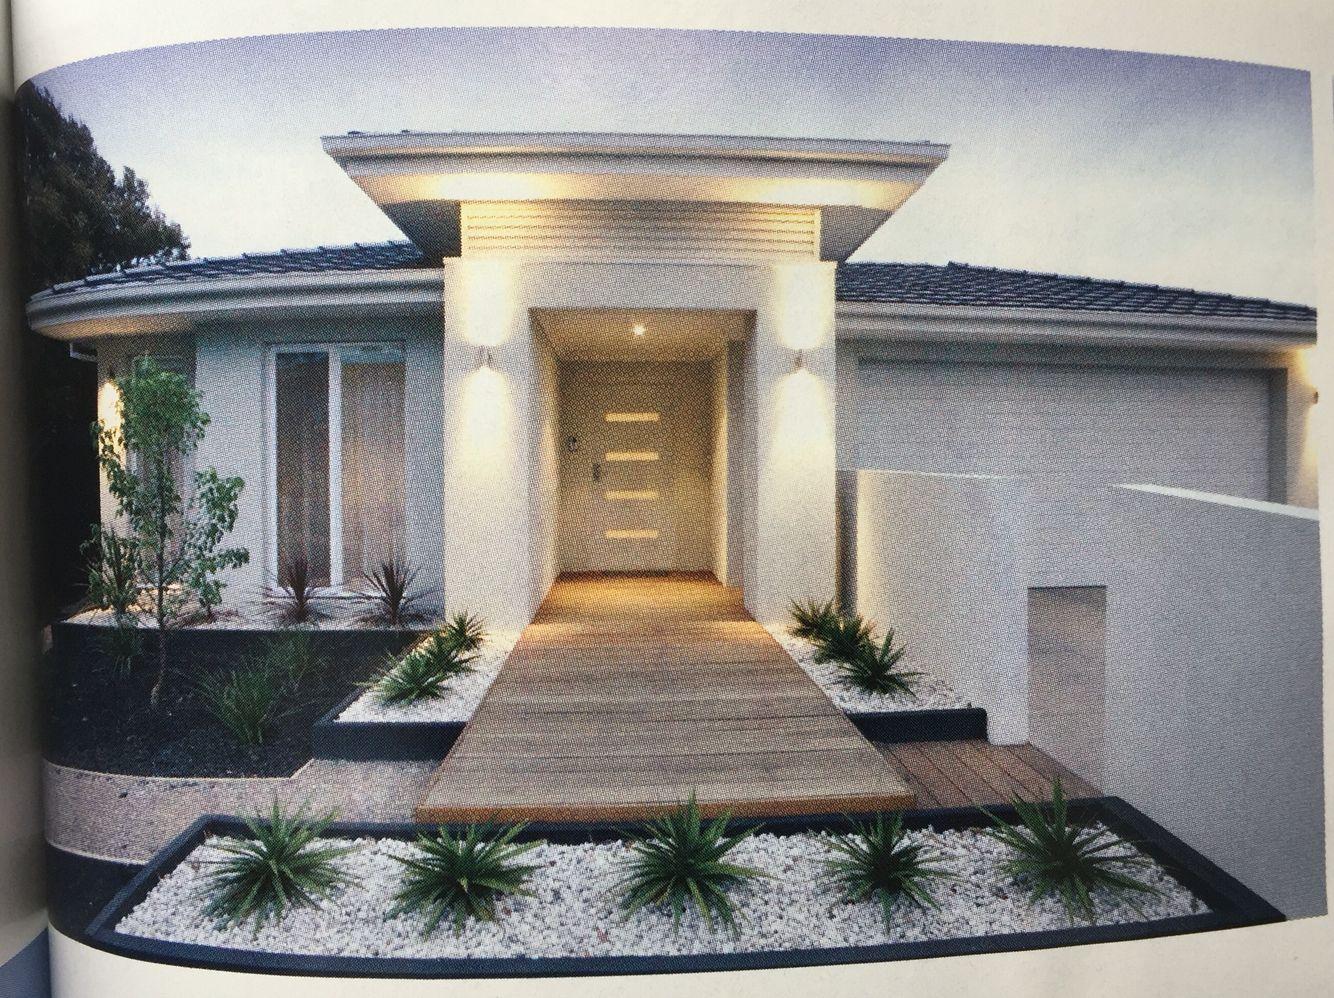 Grassless front yard | Modern landscaping, Small front ... on Grassless Garden Ideas  id=51243